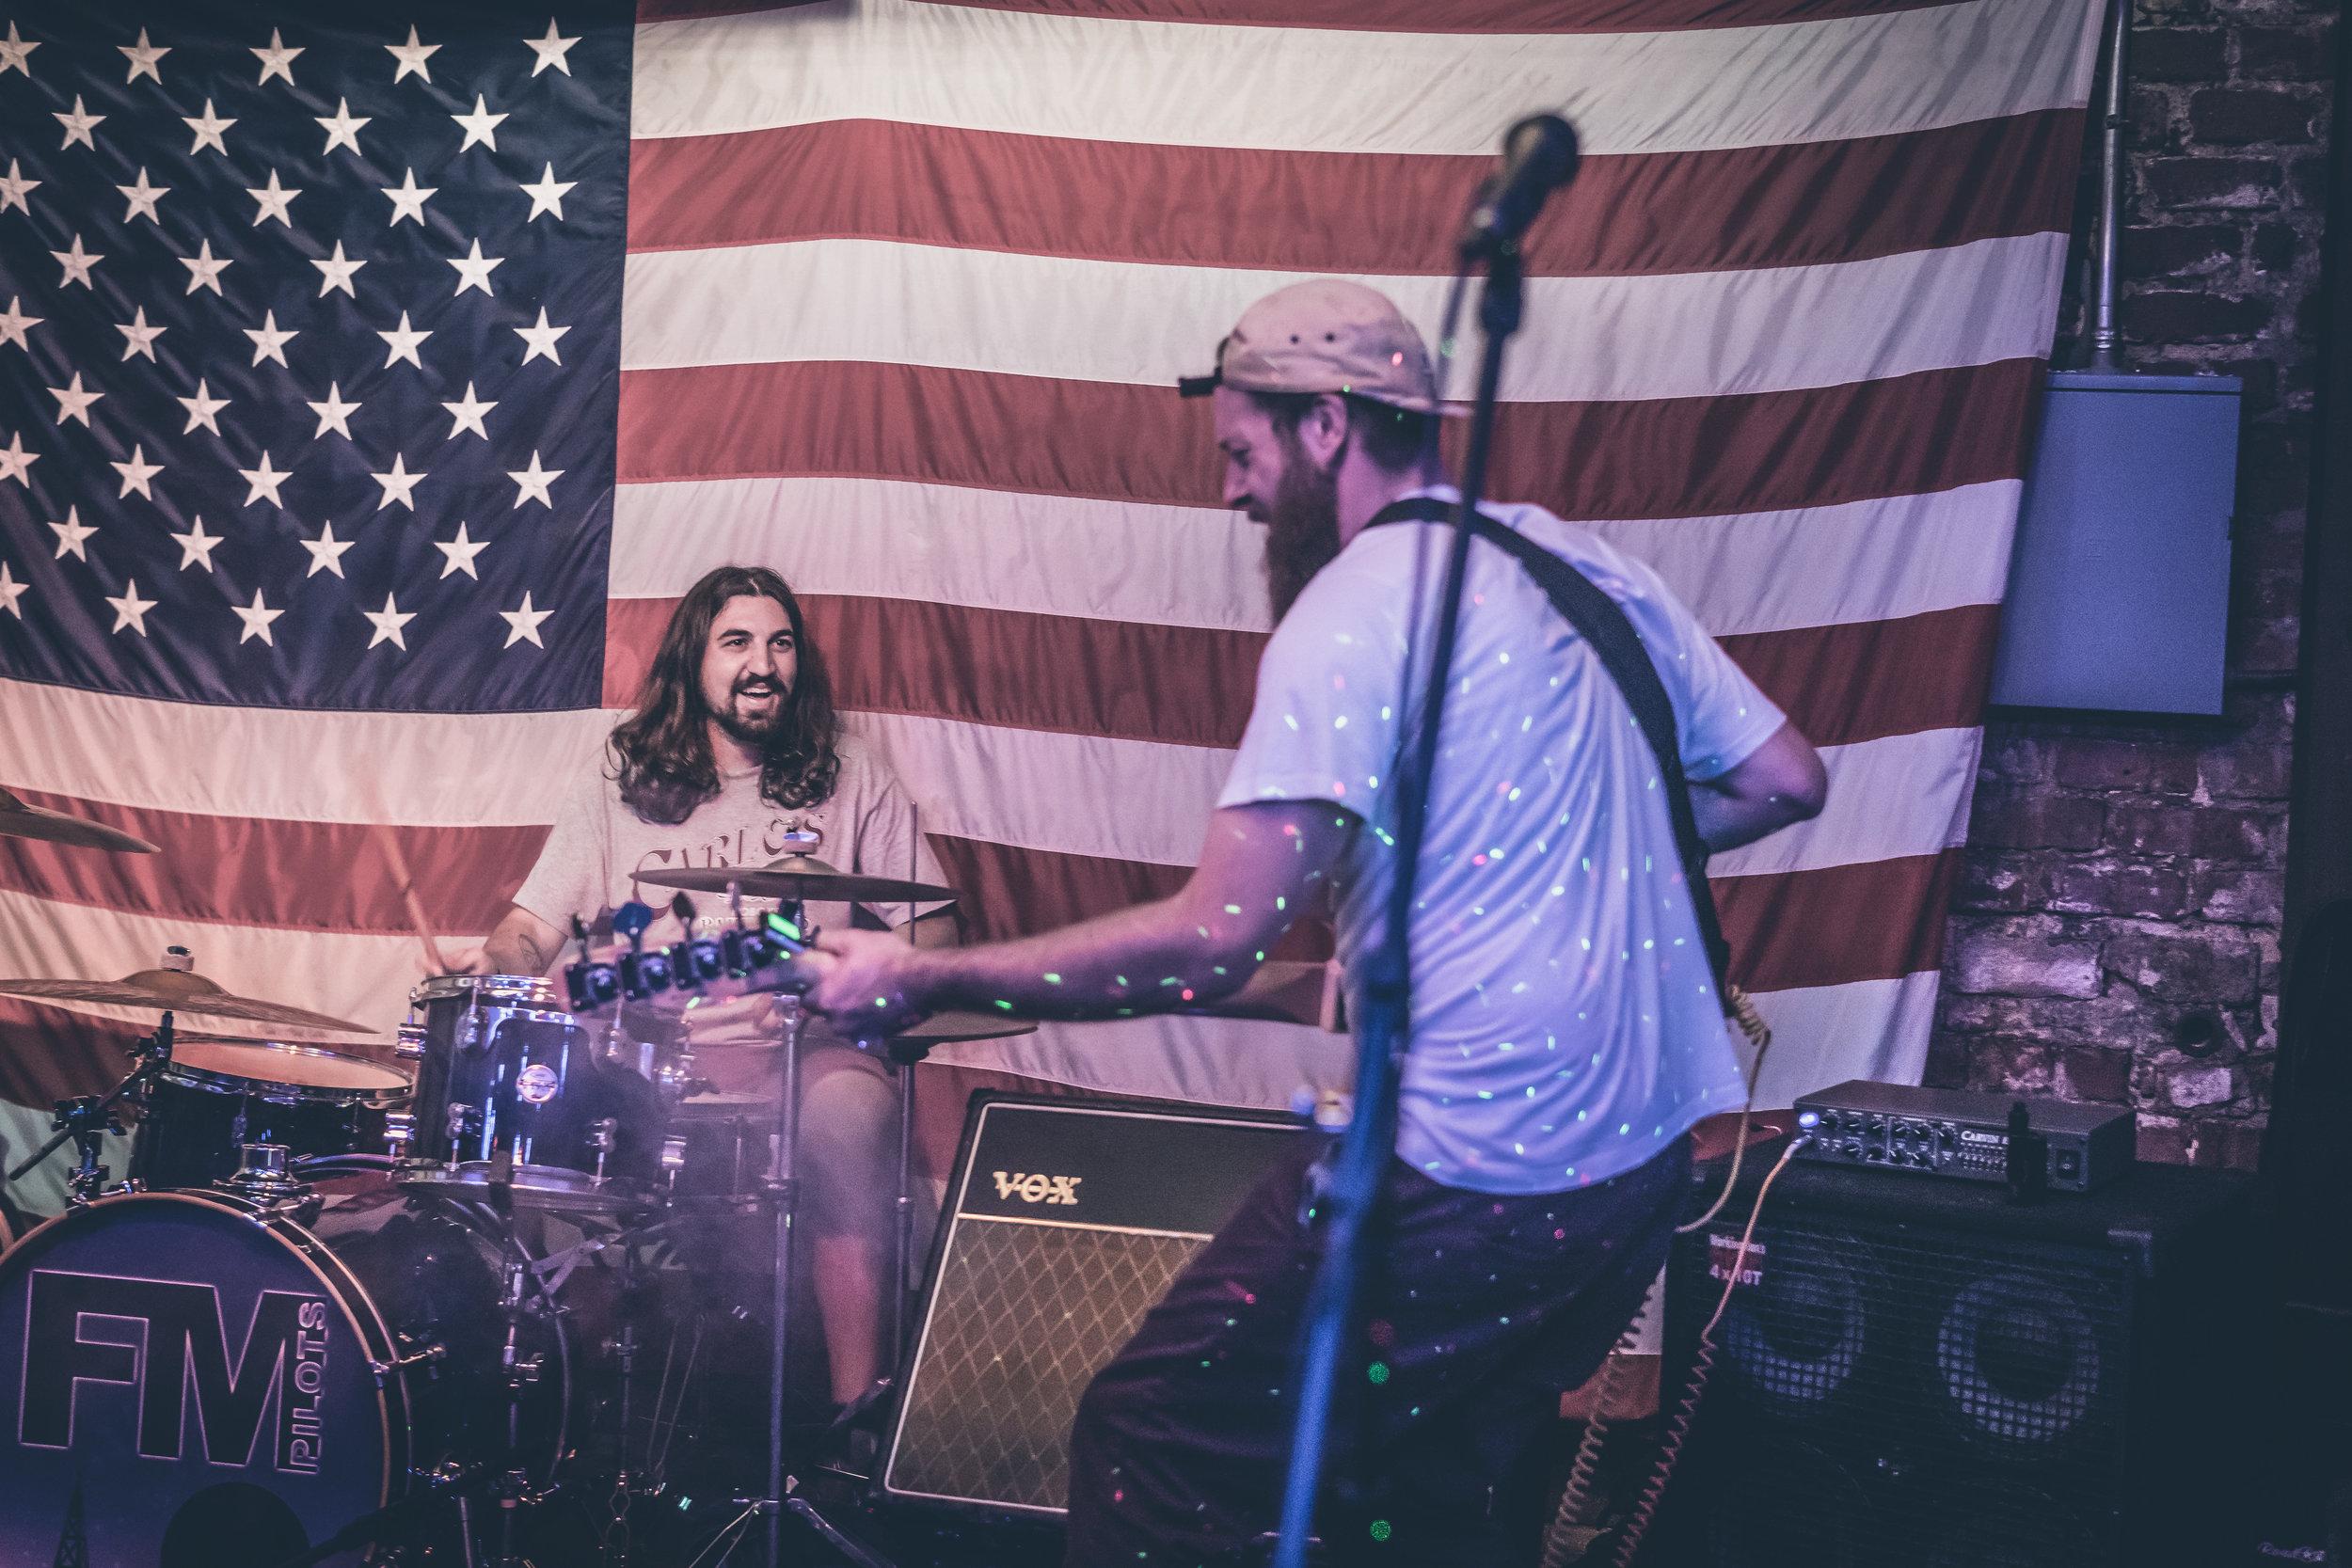 FM Pilots - Tulsa Rock Band - The Hunt Club Tulsa, OK 061016-5.jpg